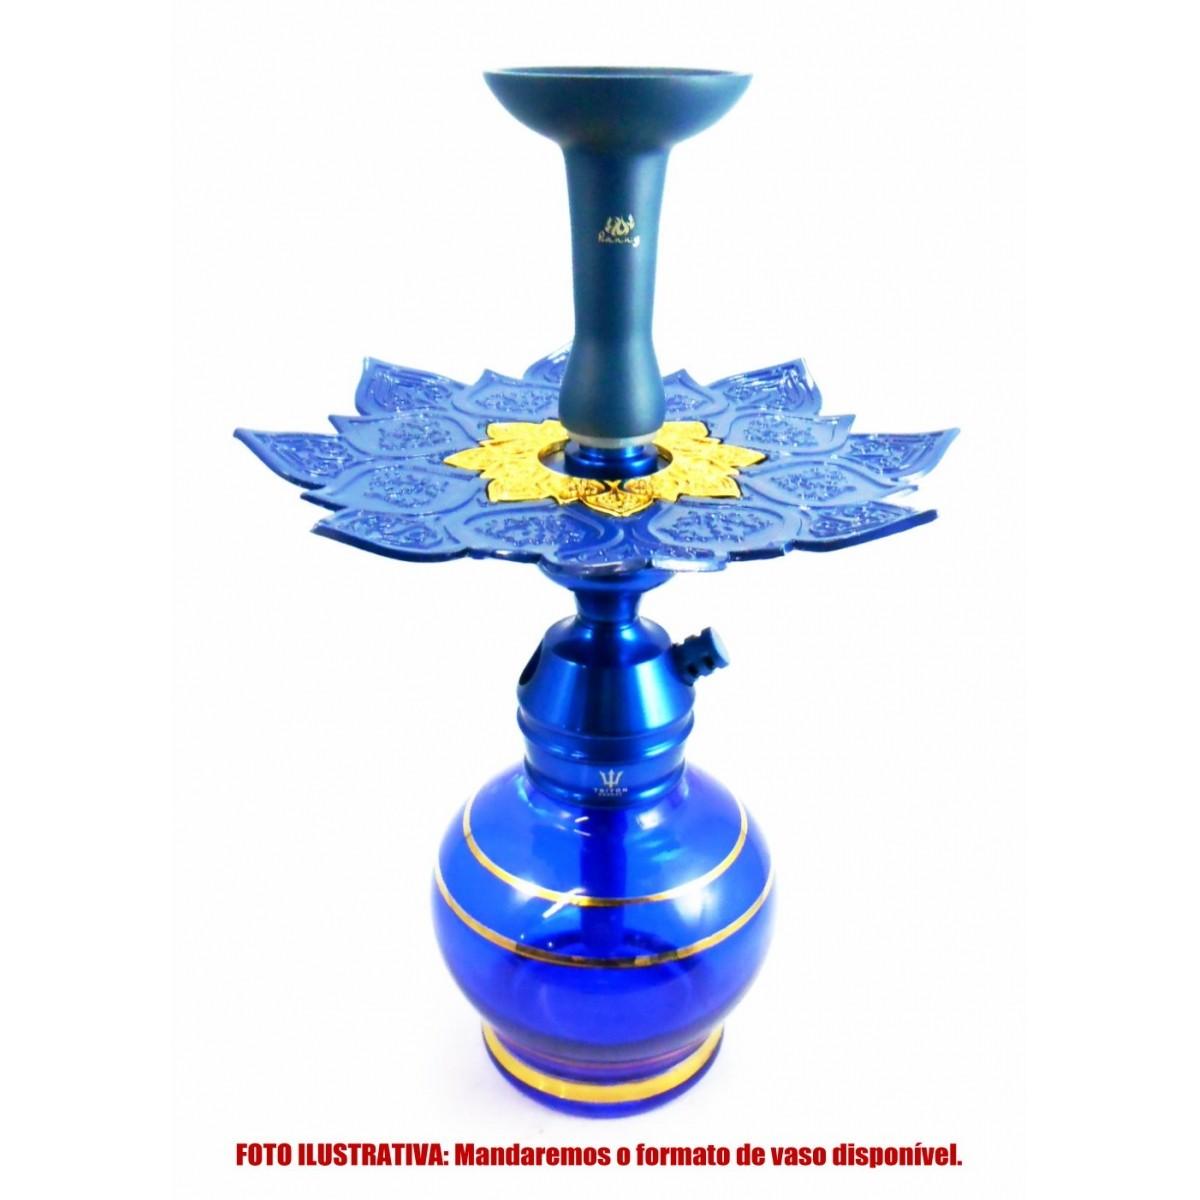 Narguile TRITON ZIP 35cm SETUP sem mangueira, vaso Kimo AZUL dourado, fornilho alumínio azul, Prato Athenas Azul/Dourado